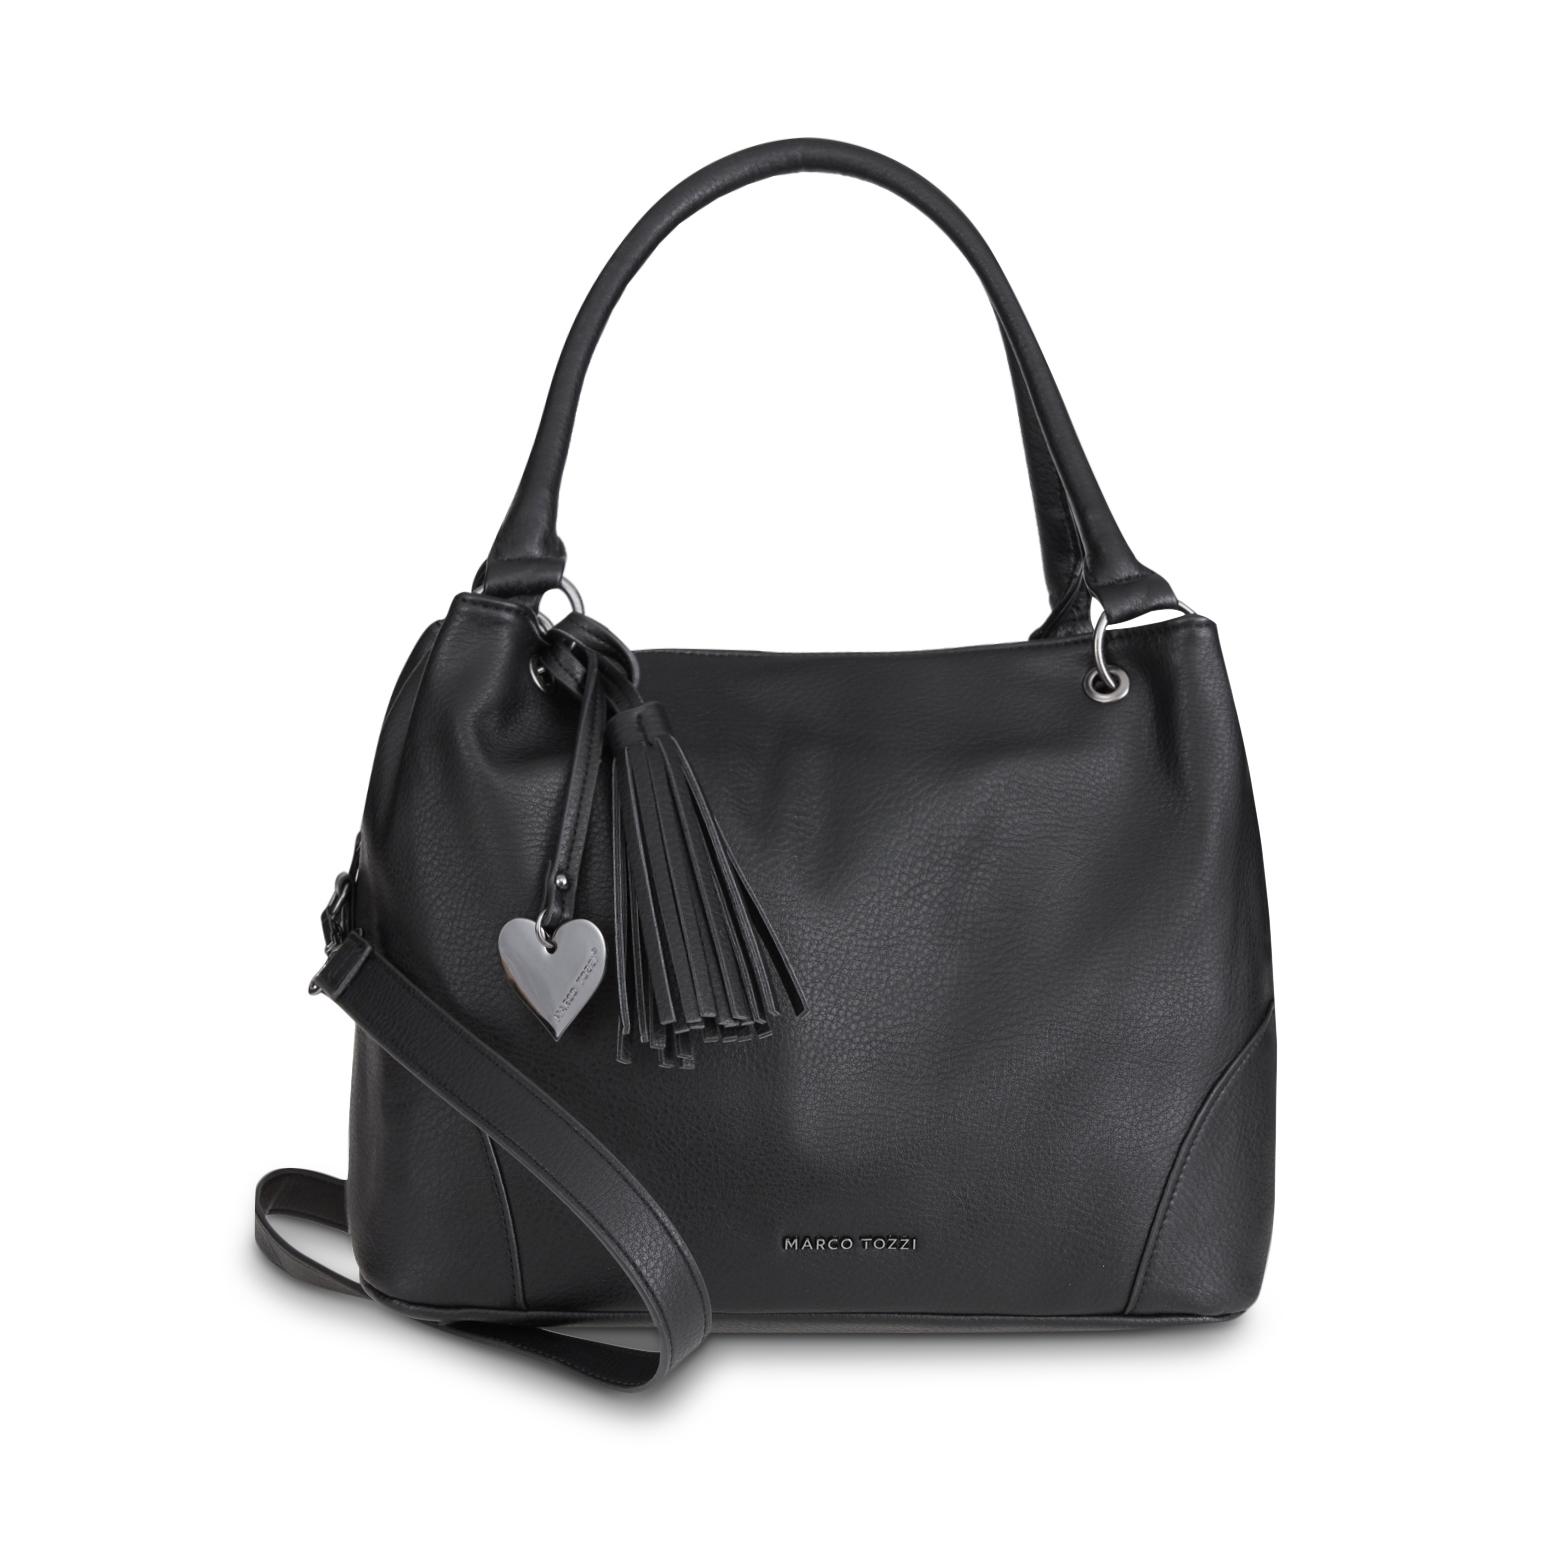 sac a main noir 2 2 61011 23 001 1 buy sacs a main from marco tozzi online